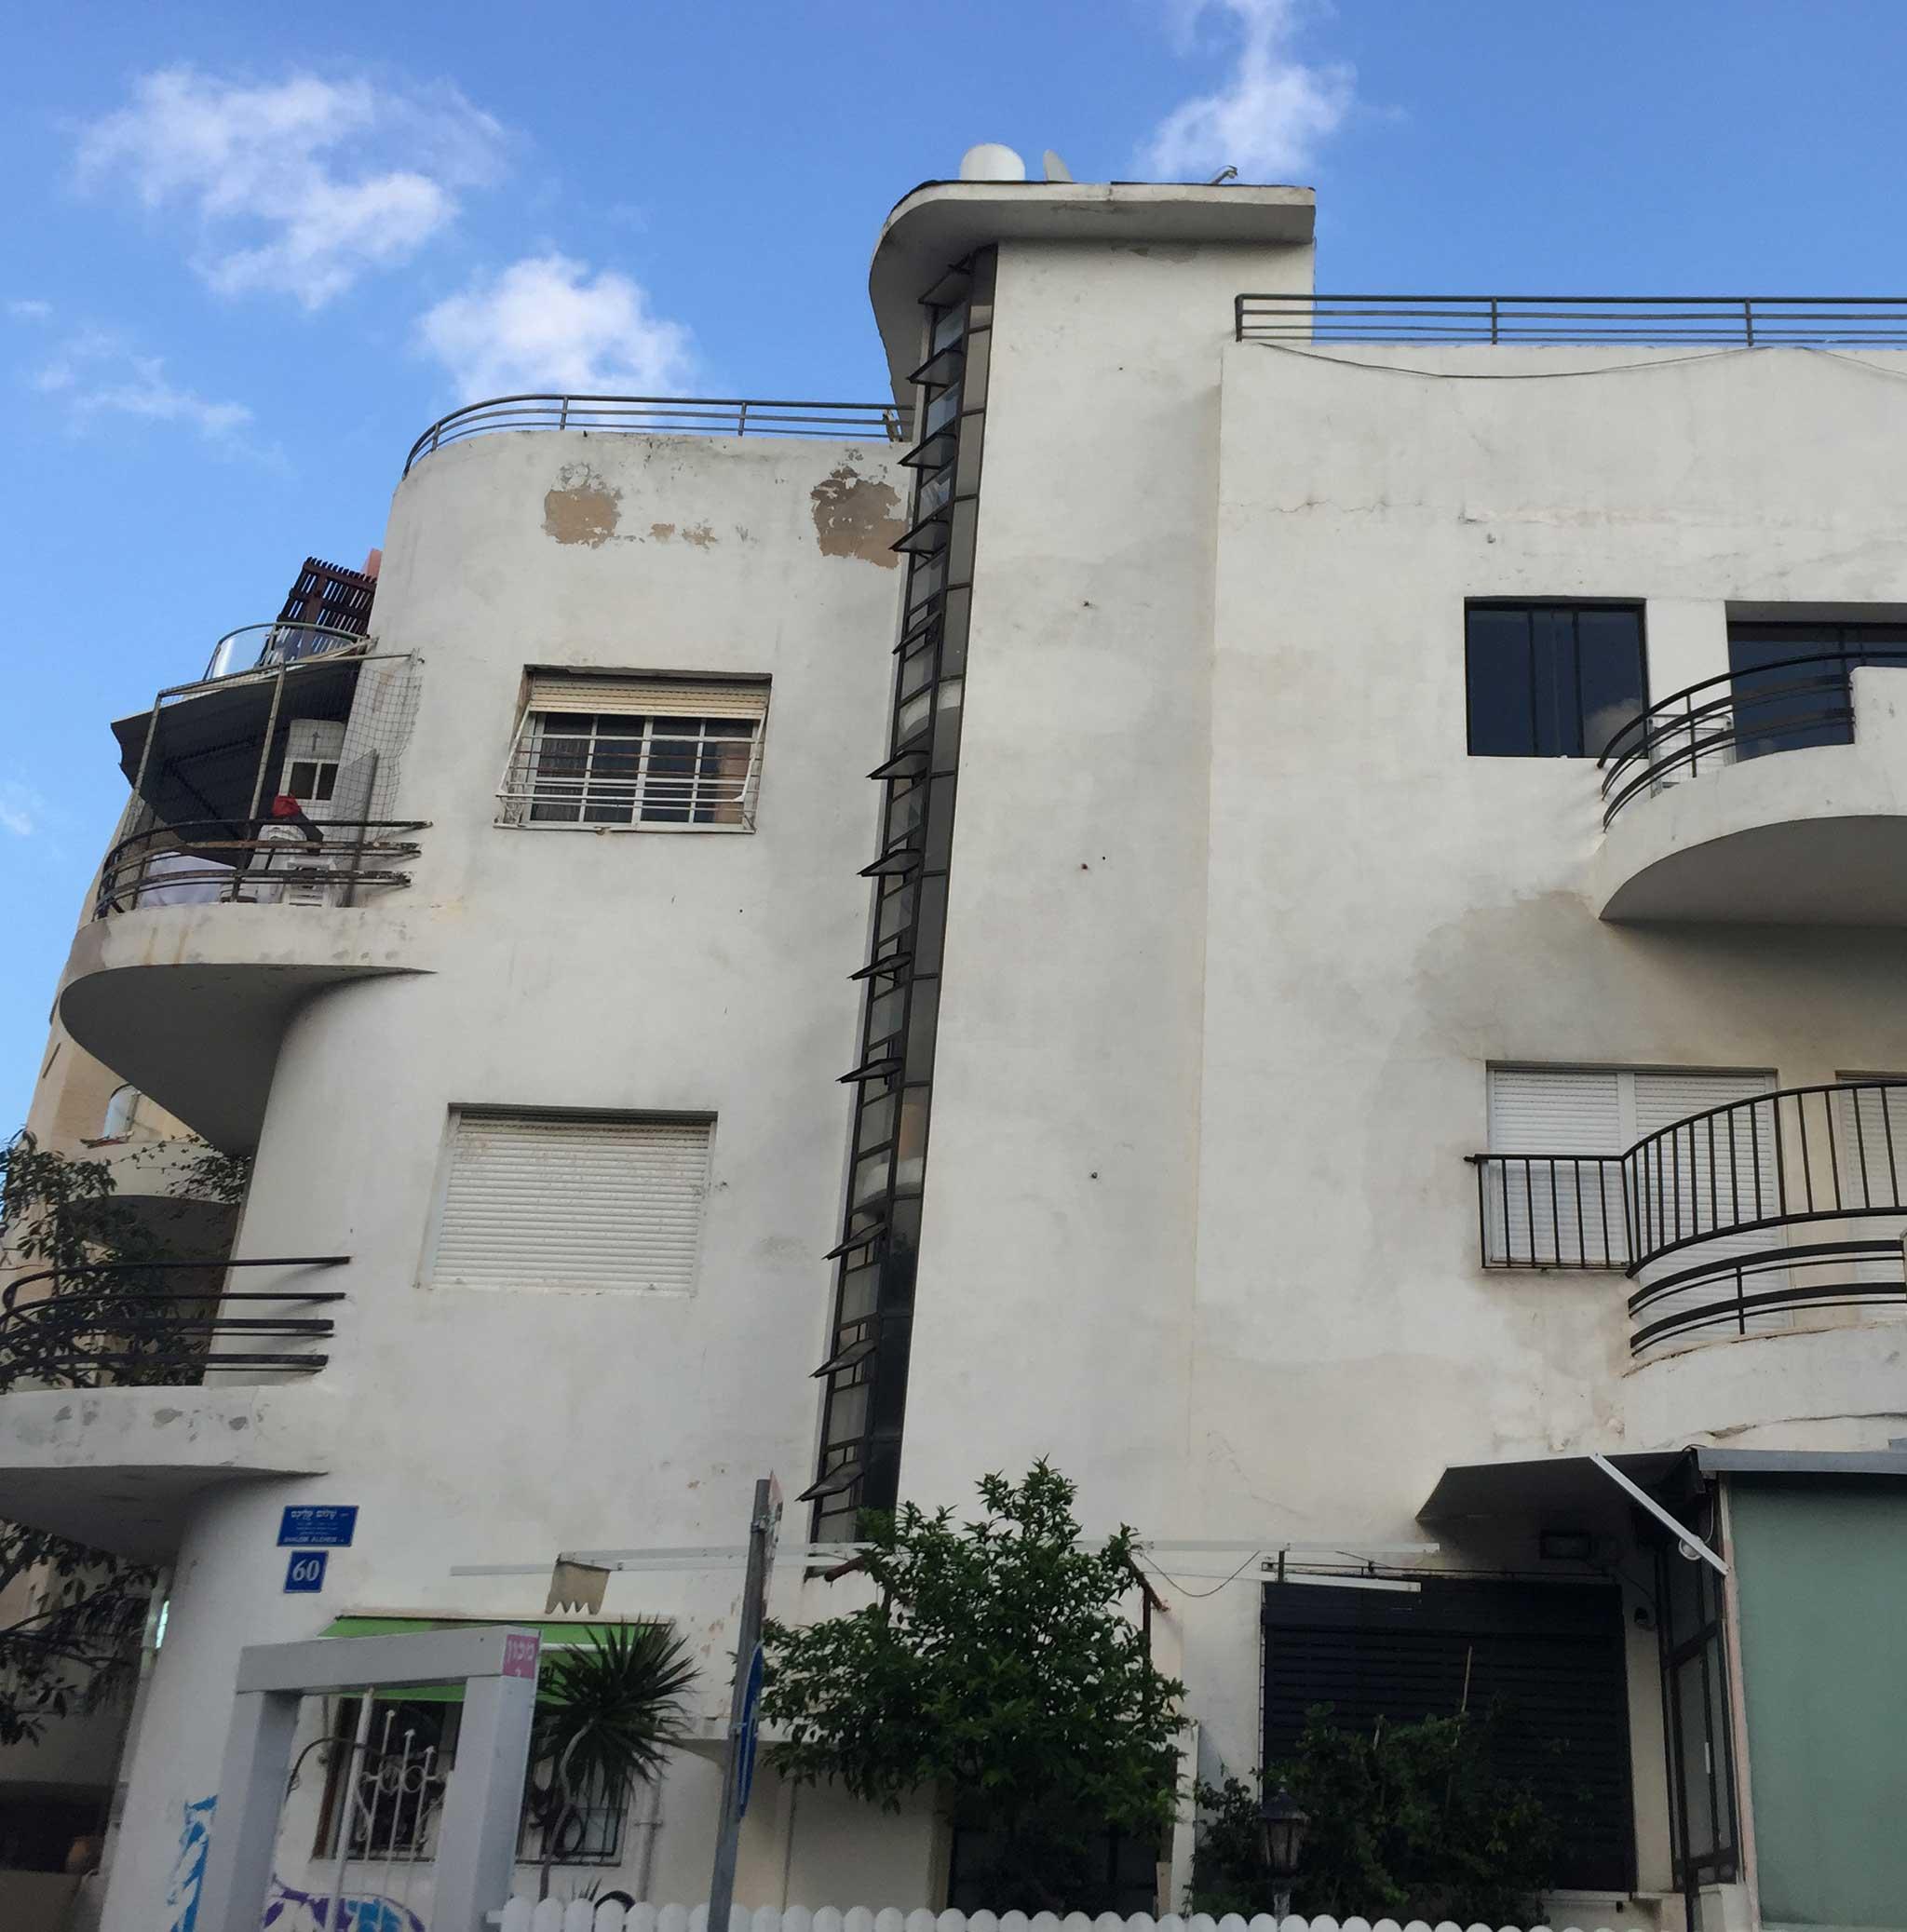 Right on Dove Hoz St on Tel Aviv audio tour The White City